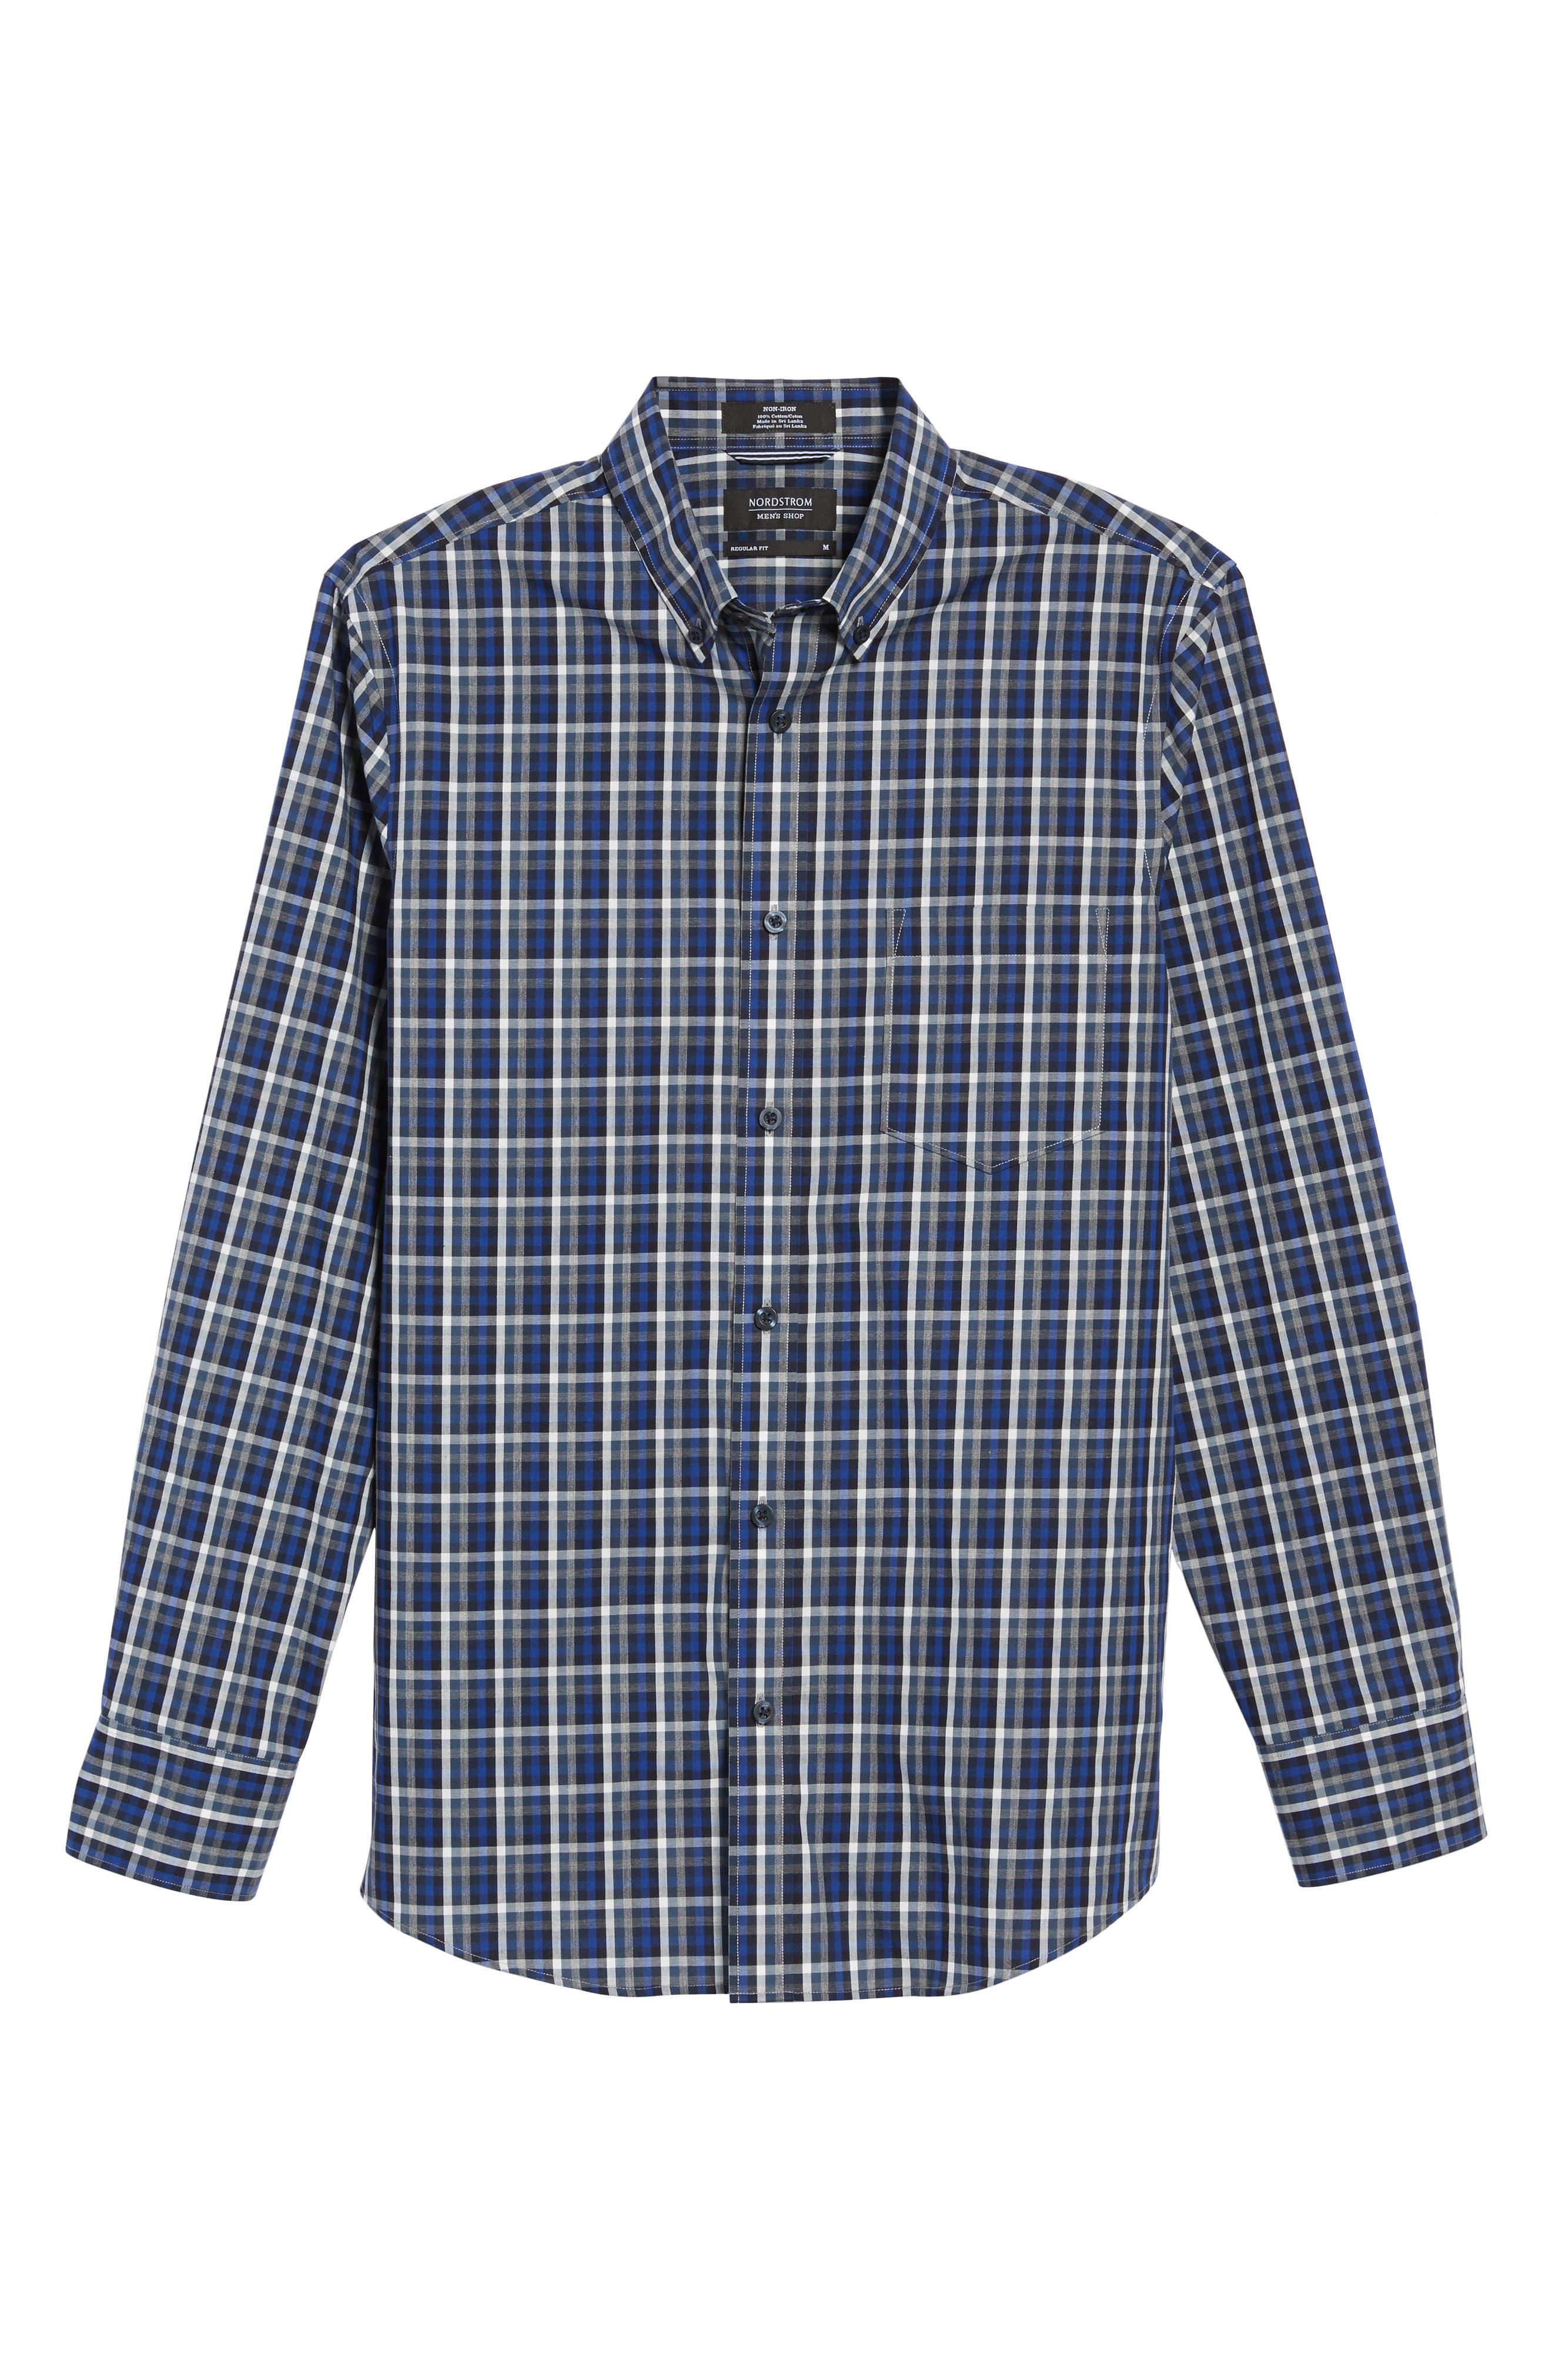 Regular Fit Non-Iron Spade Check Dress Shirt,                             Alternate thumbnail 6, color,                             401